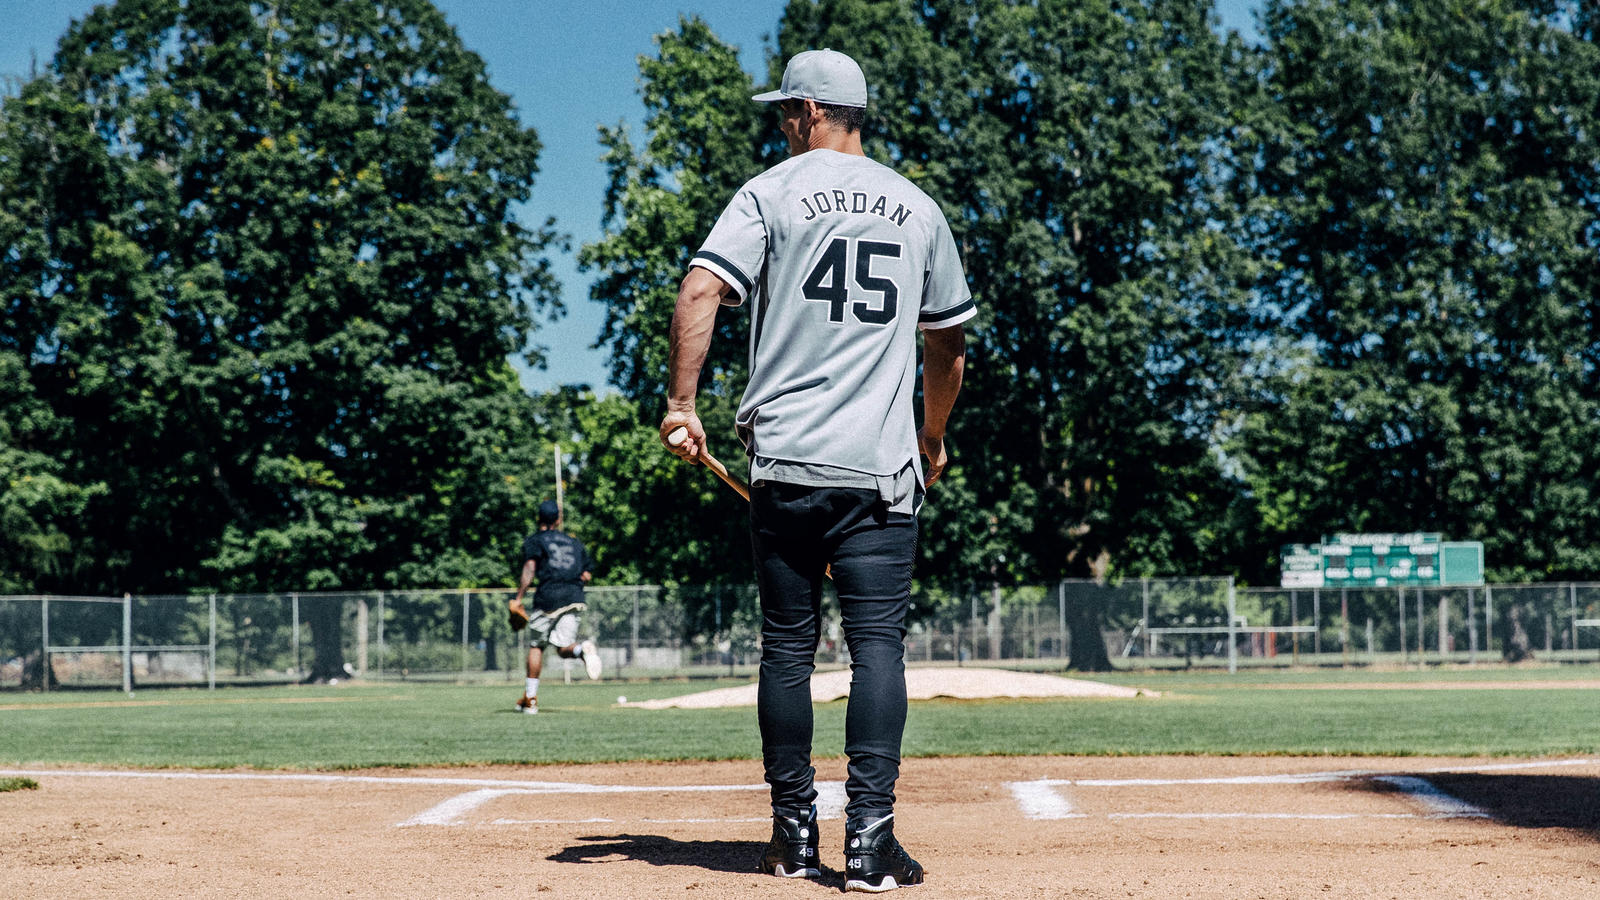 12505d032894 Air Jordan IX Pinnacle Celebrates MJ s Love for Baseball - Nike News